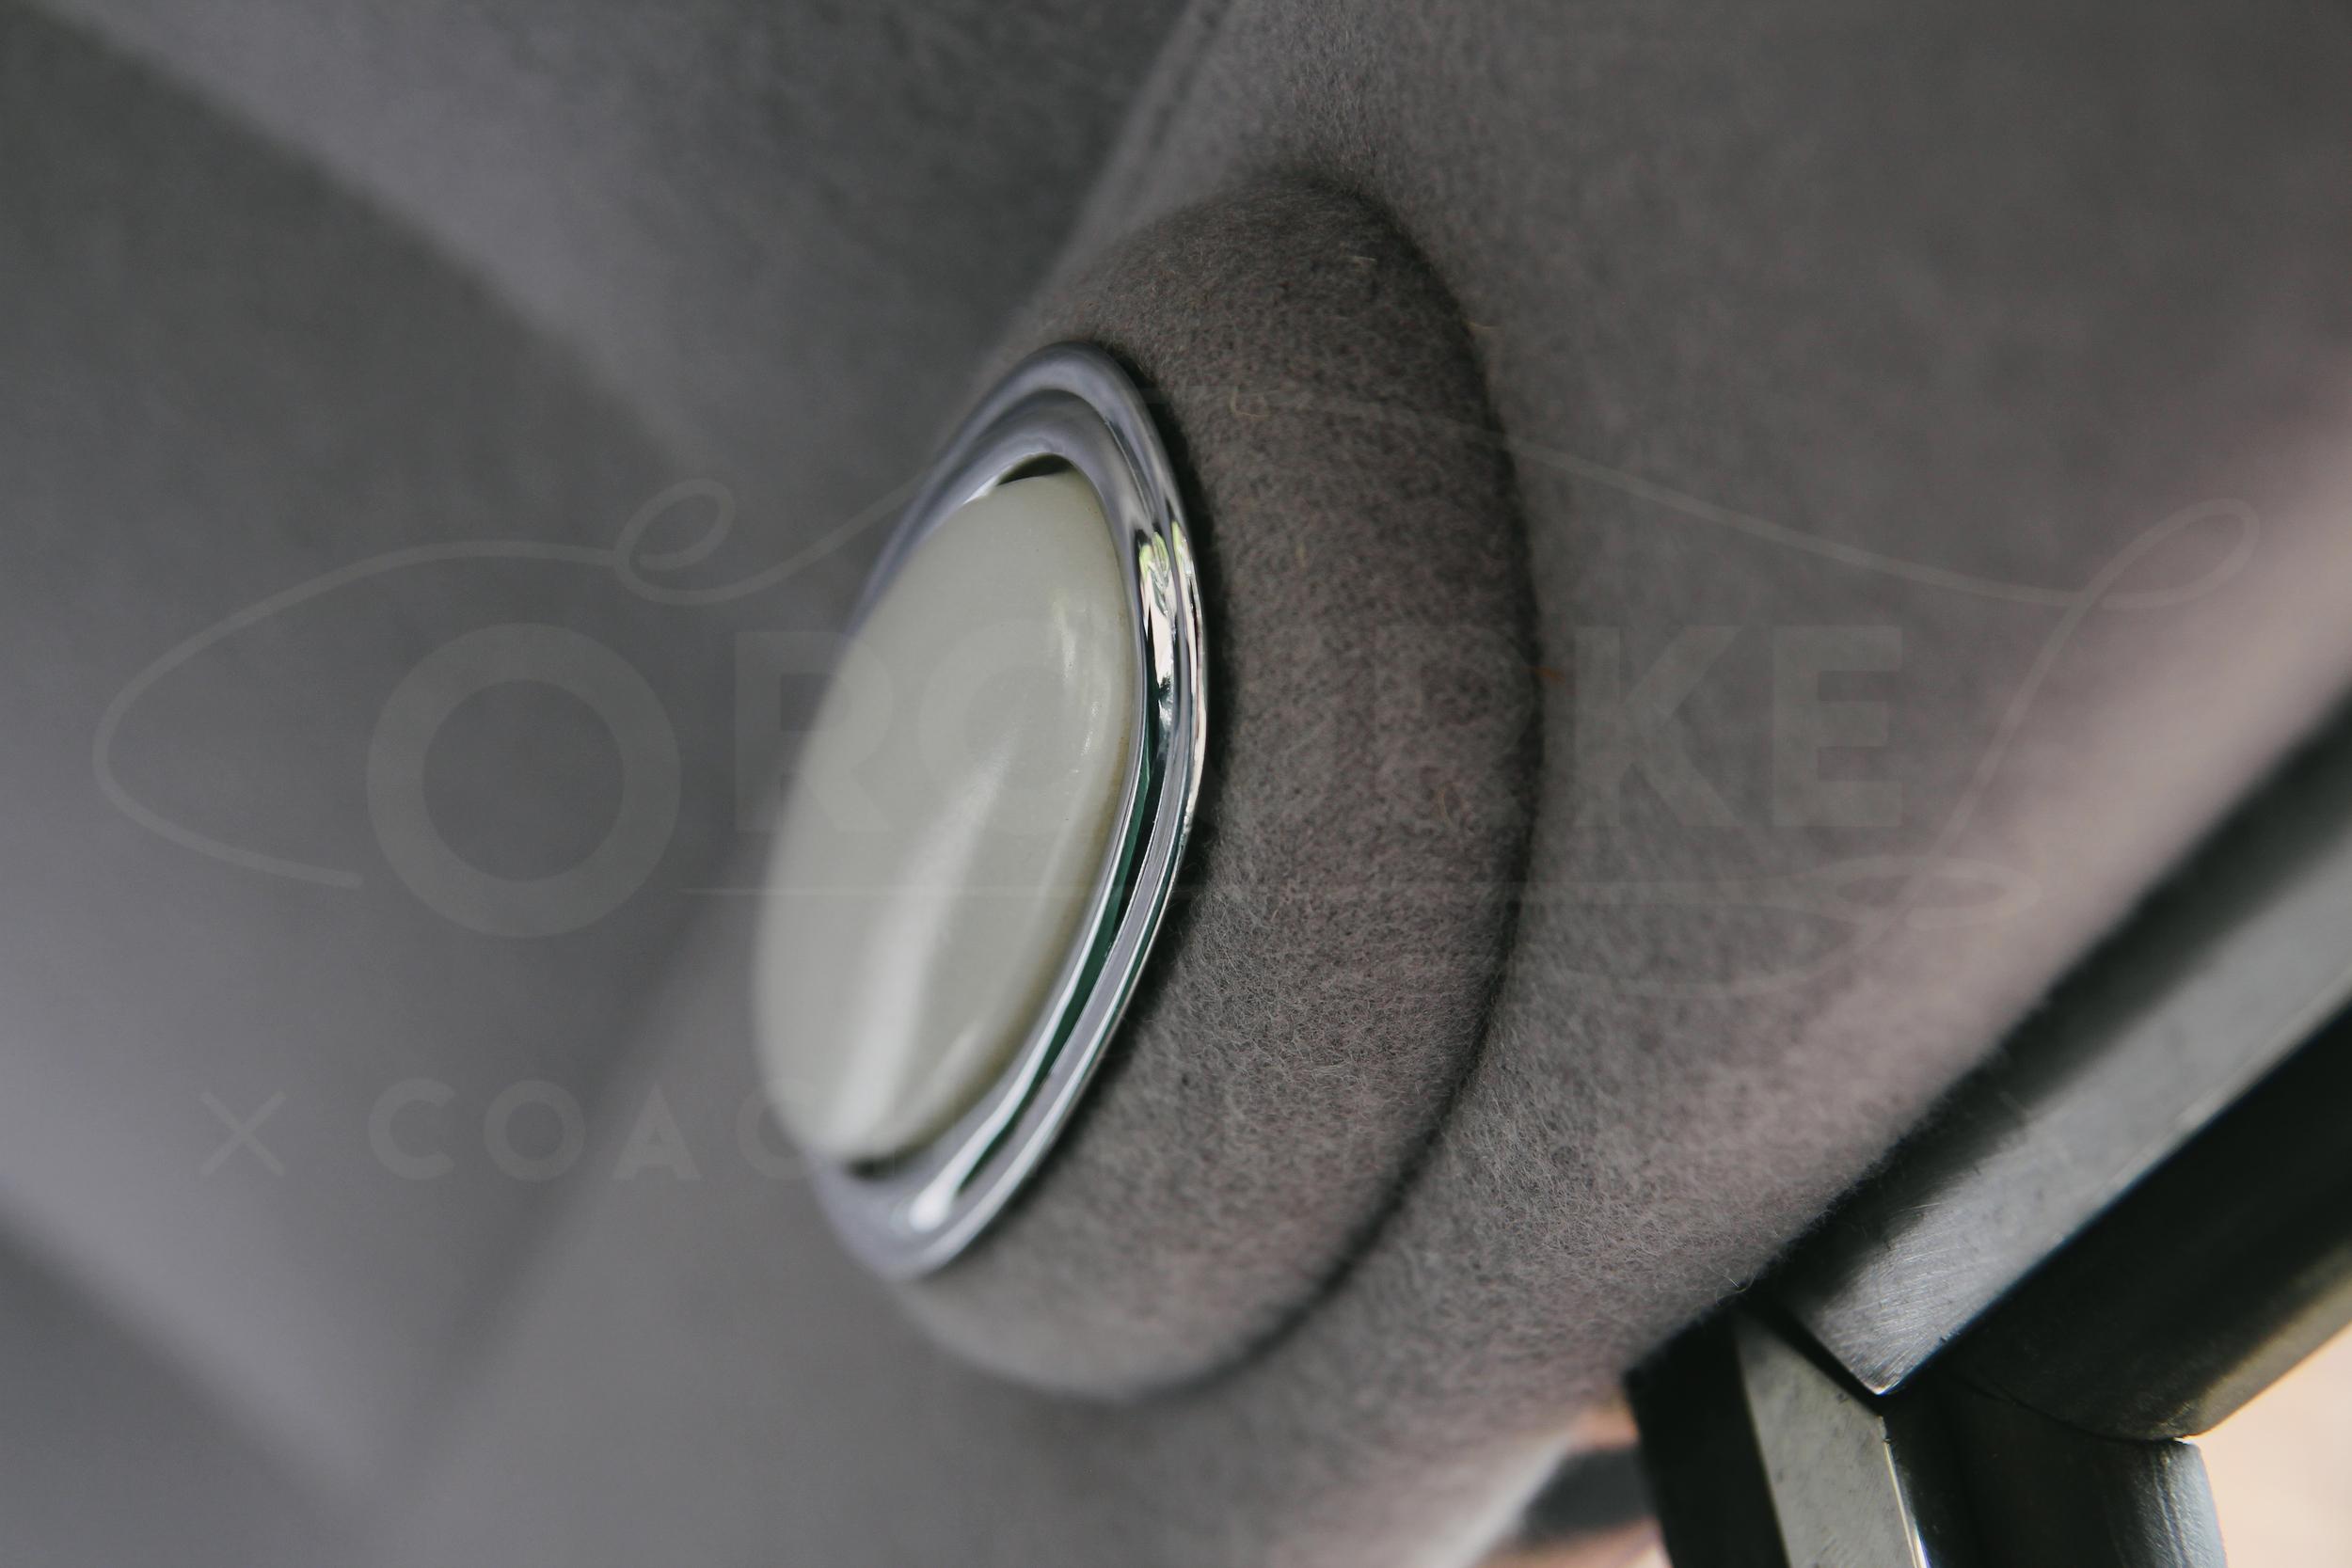 o-rourke-coachtrimmers-lancia-aurelia-5.jpg